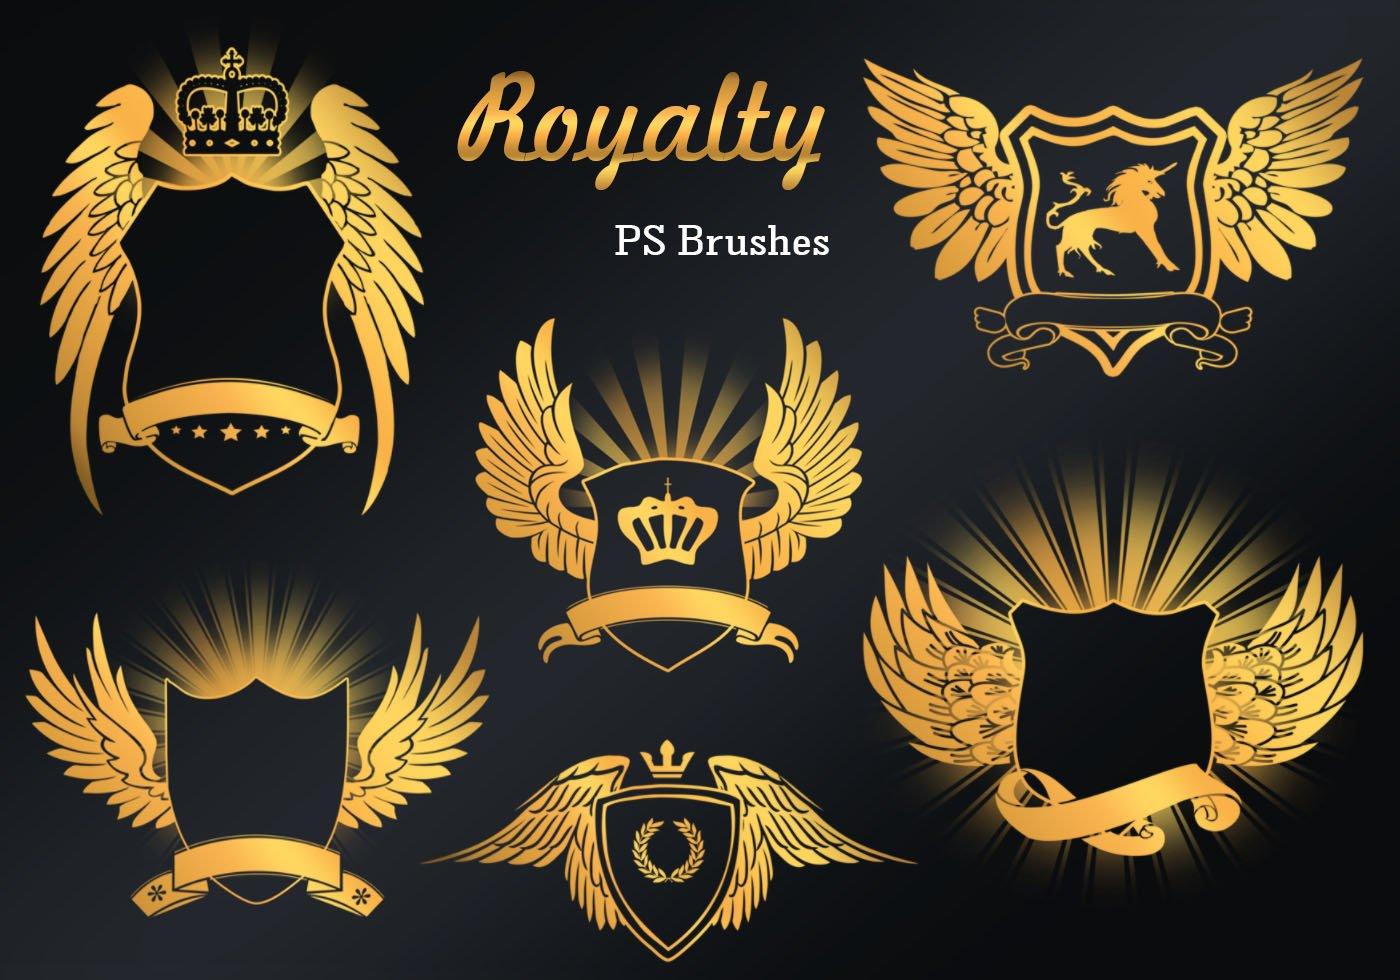 20 Royalty Emblem PS Brushes abr. vol.9 - Free Photoshop ...